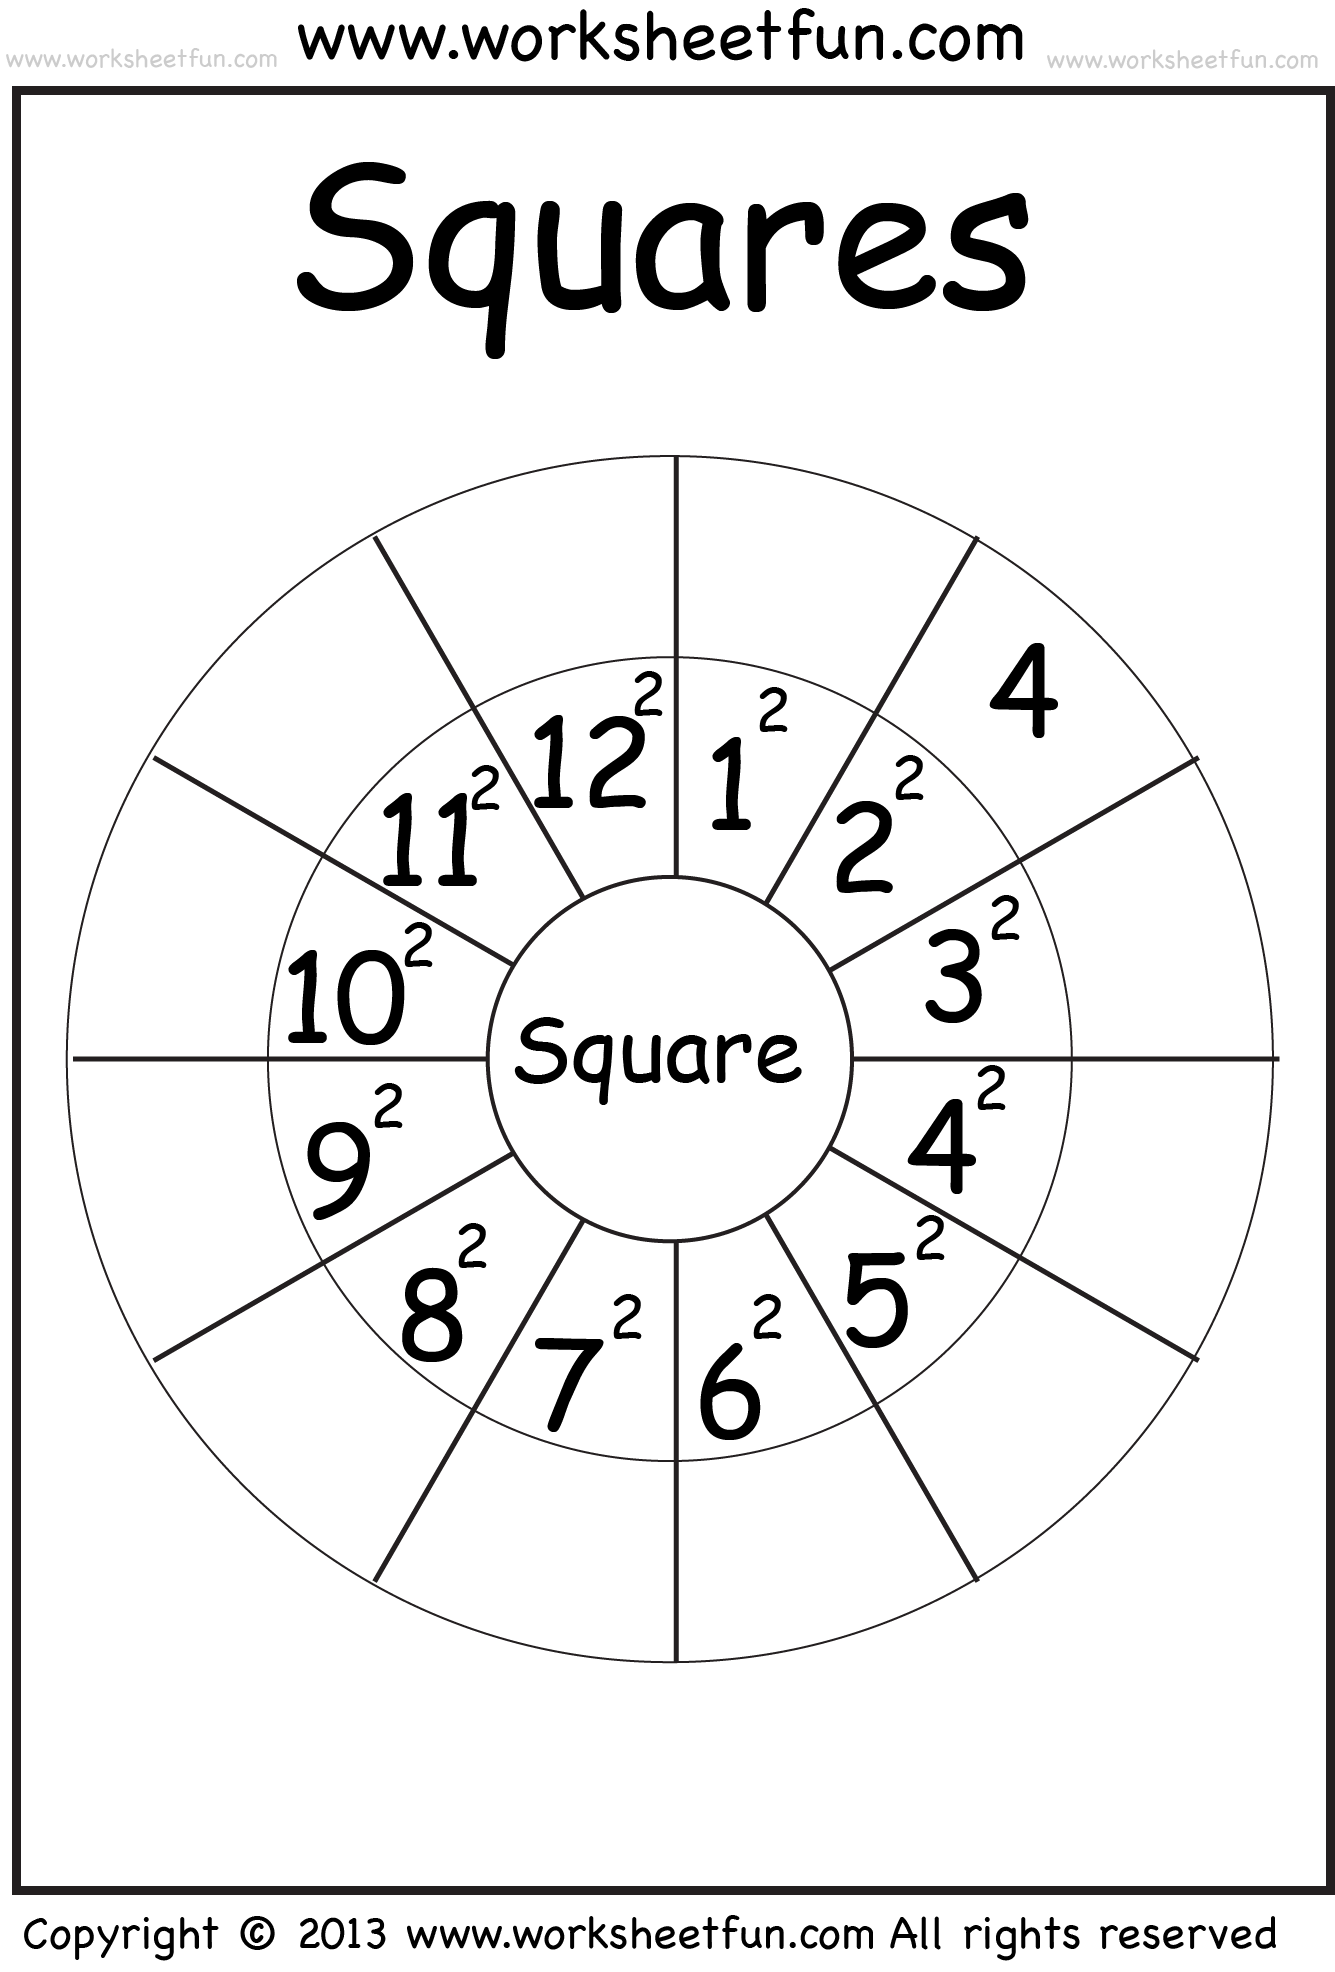 Worksheets Perfect Square Worksheets perfect squares classical conversations pinterest math squares